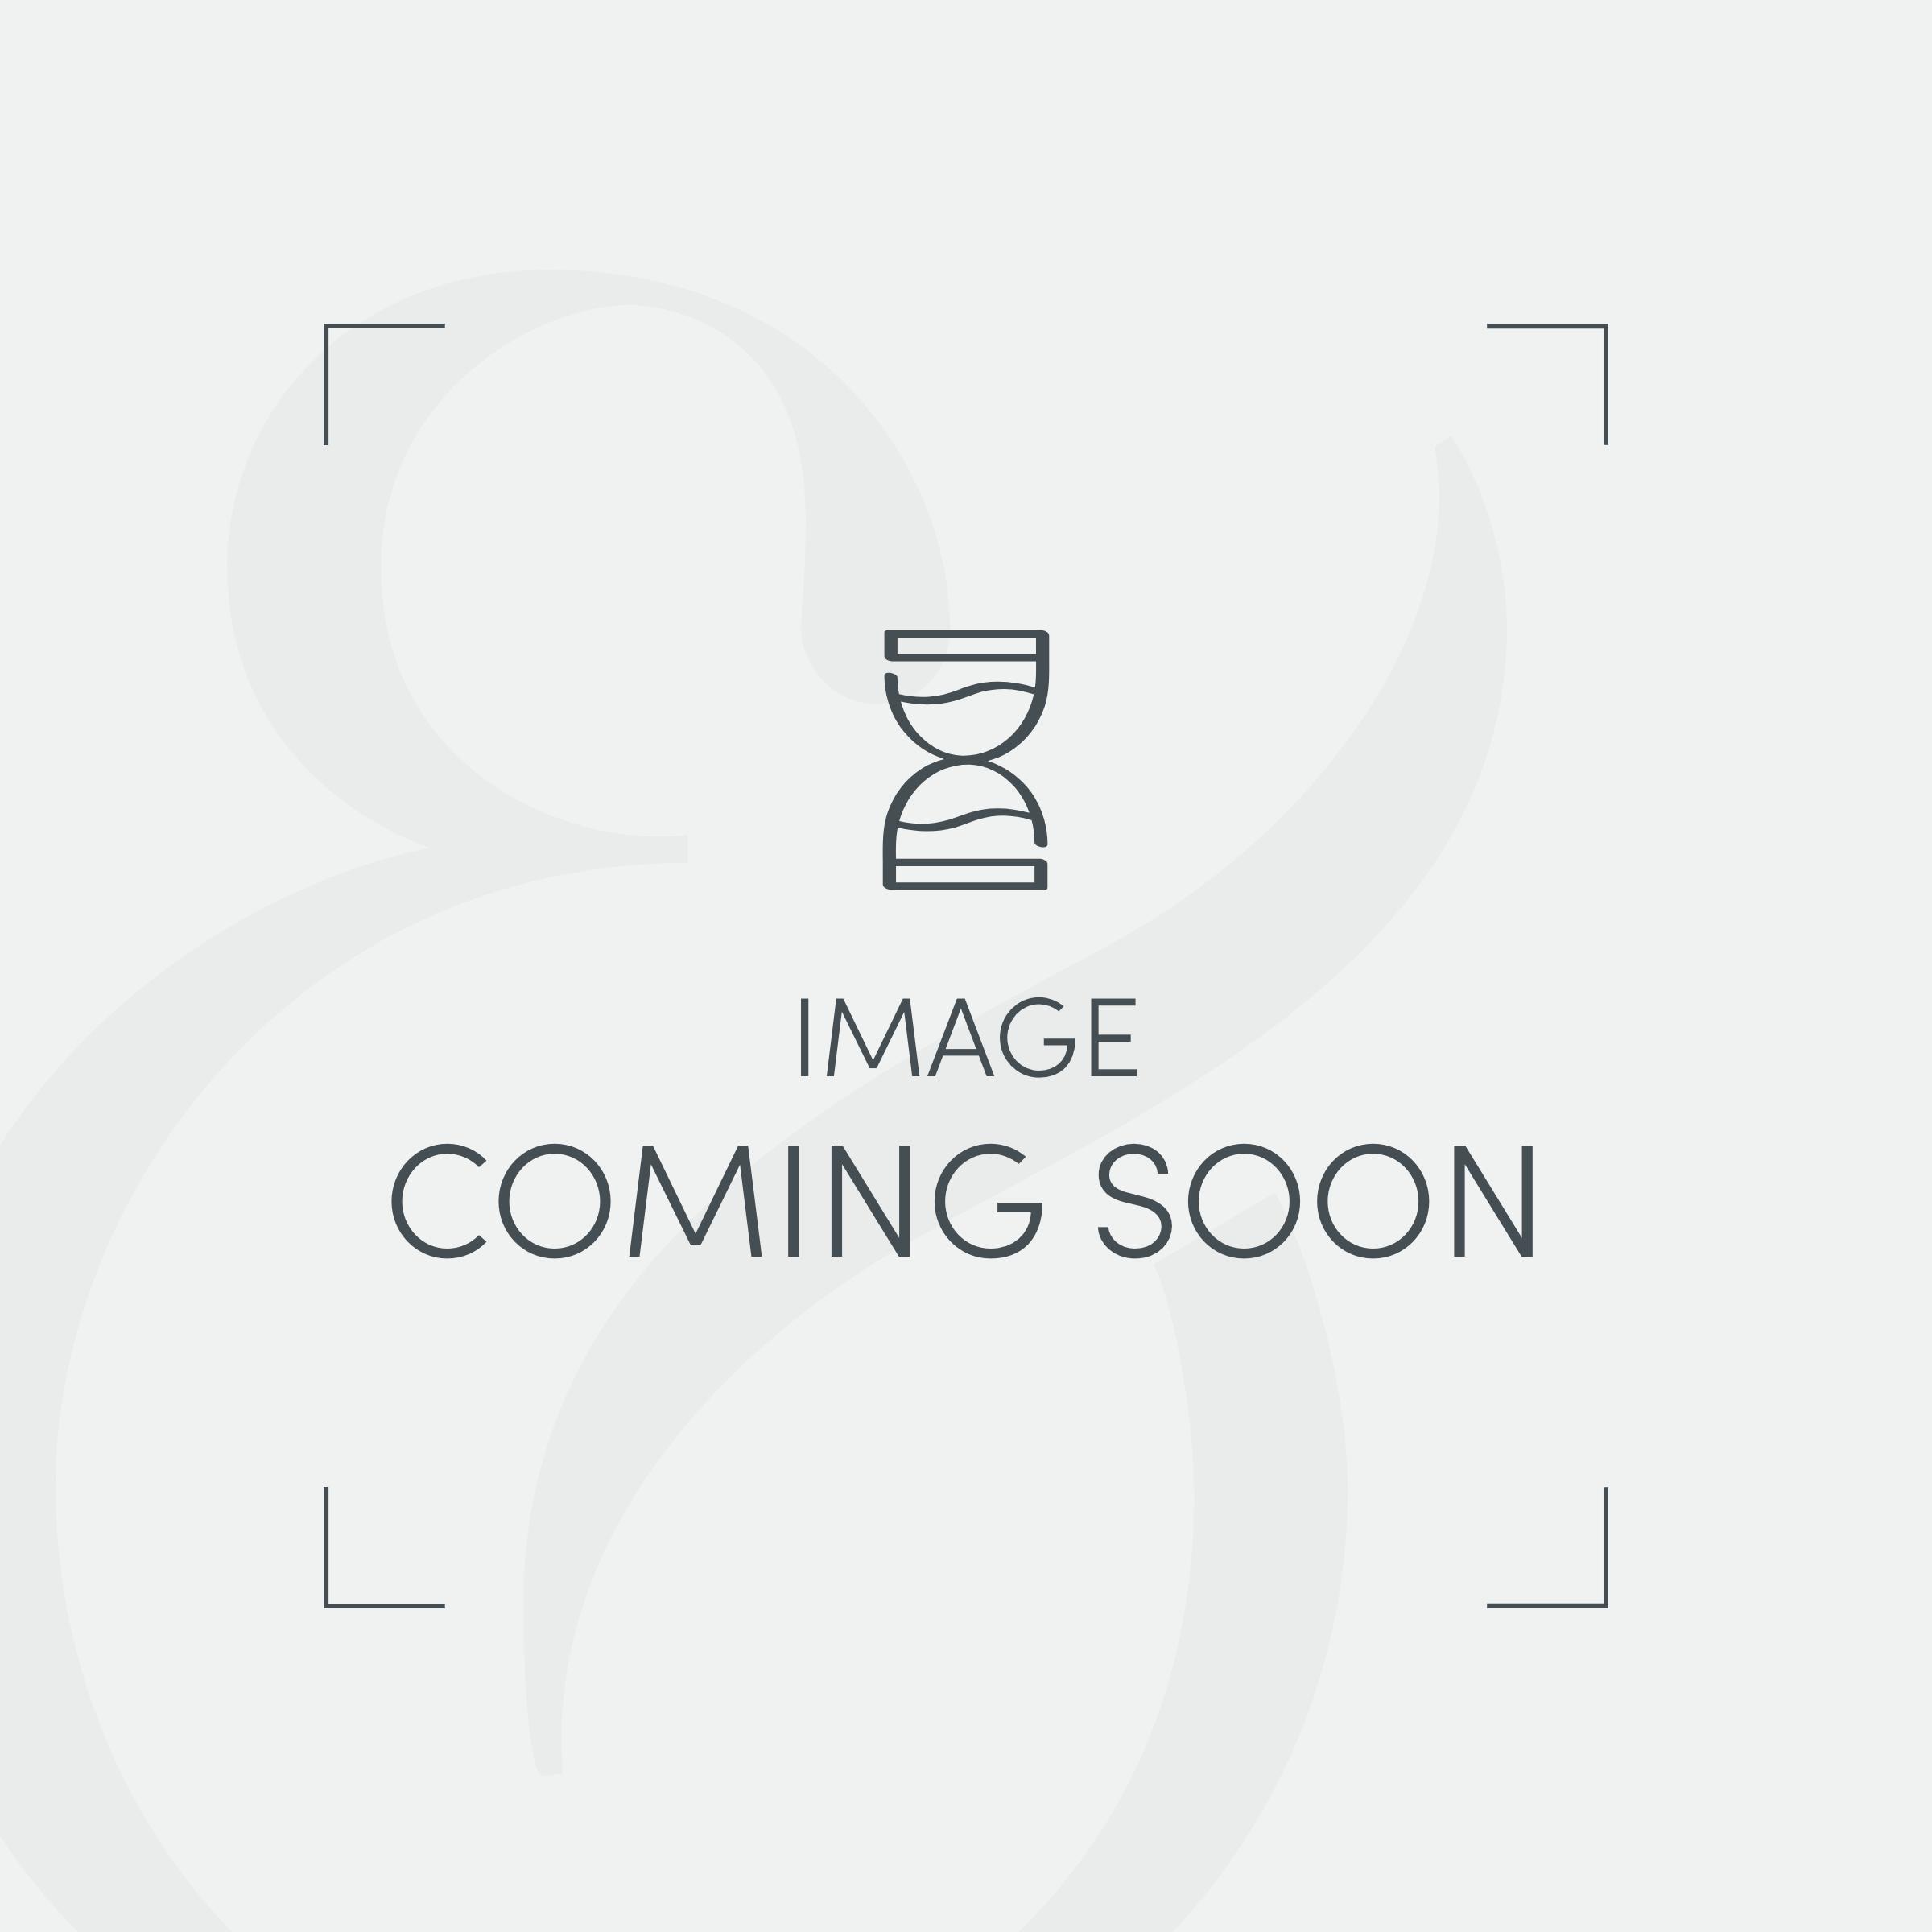 Luxury 60% Duck Down Pillow Bundle - Medium/Firm - 4 Pack